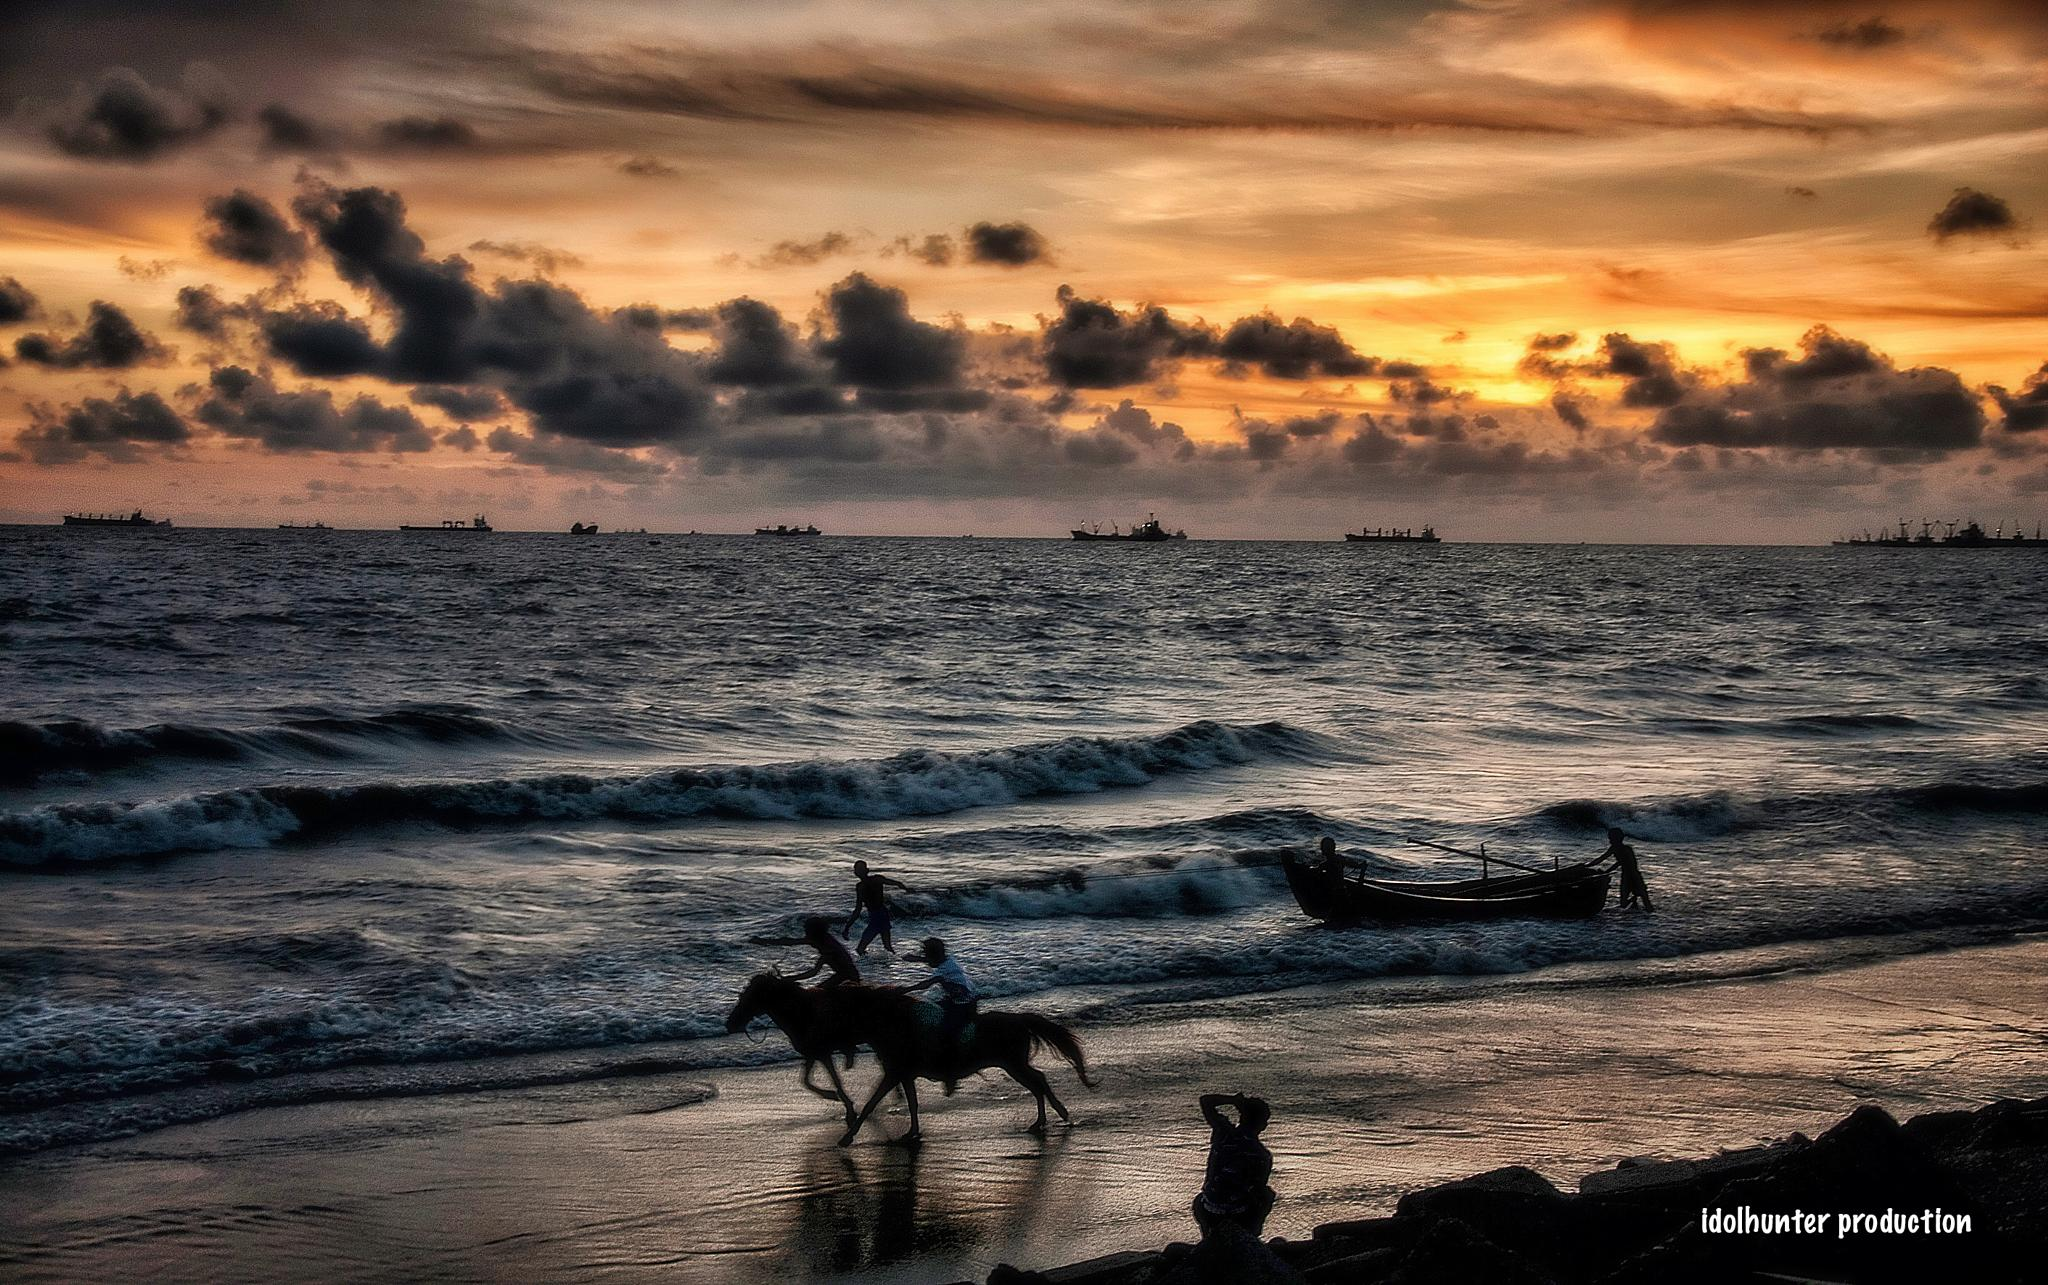 beach racing by idolhunter